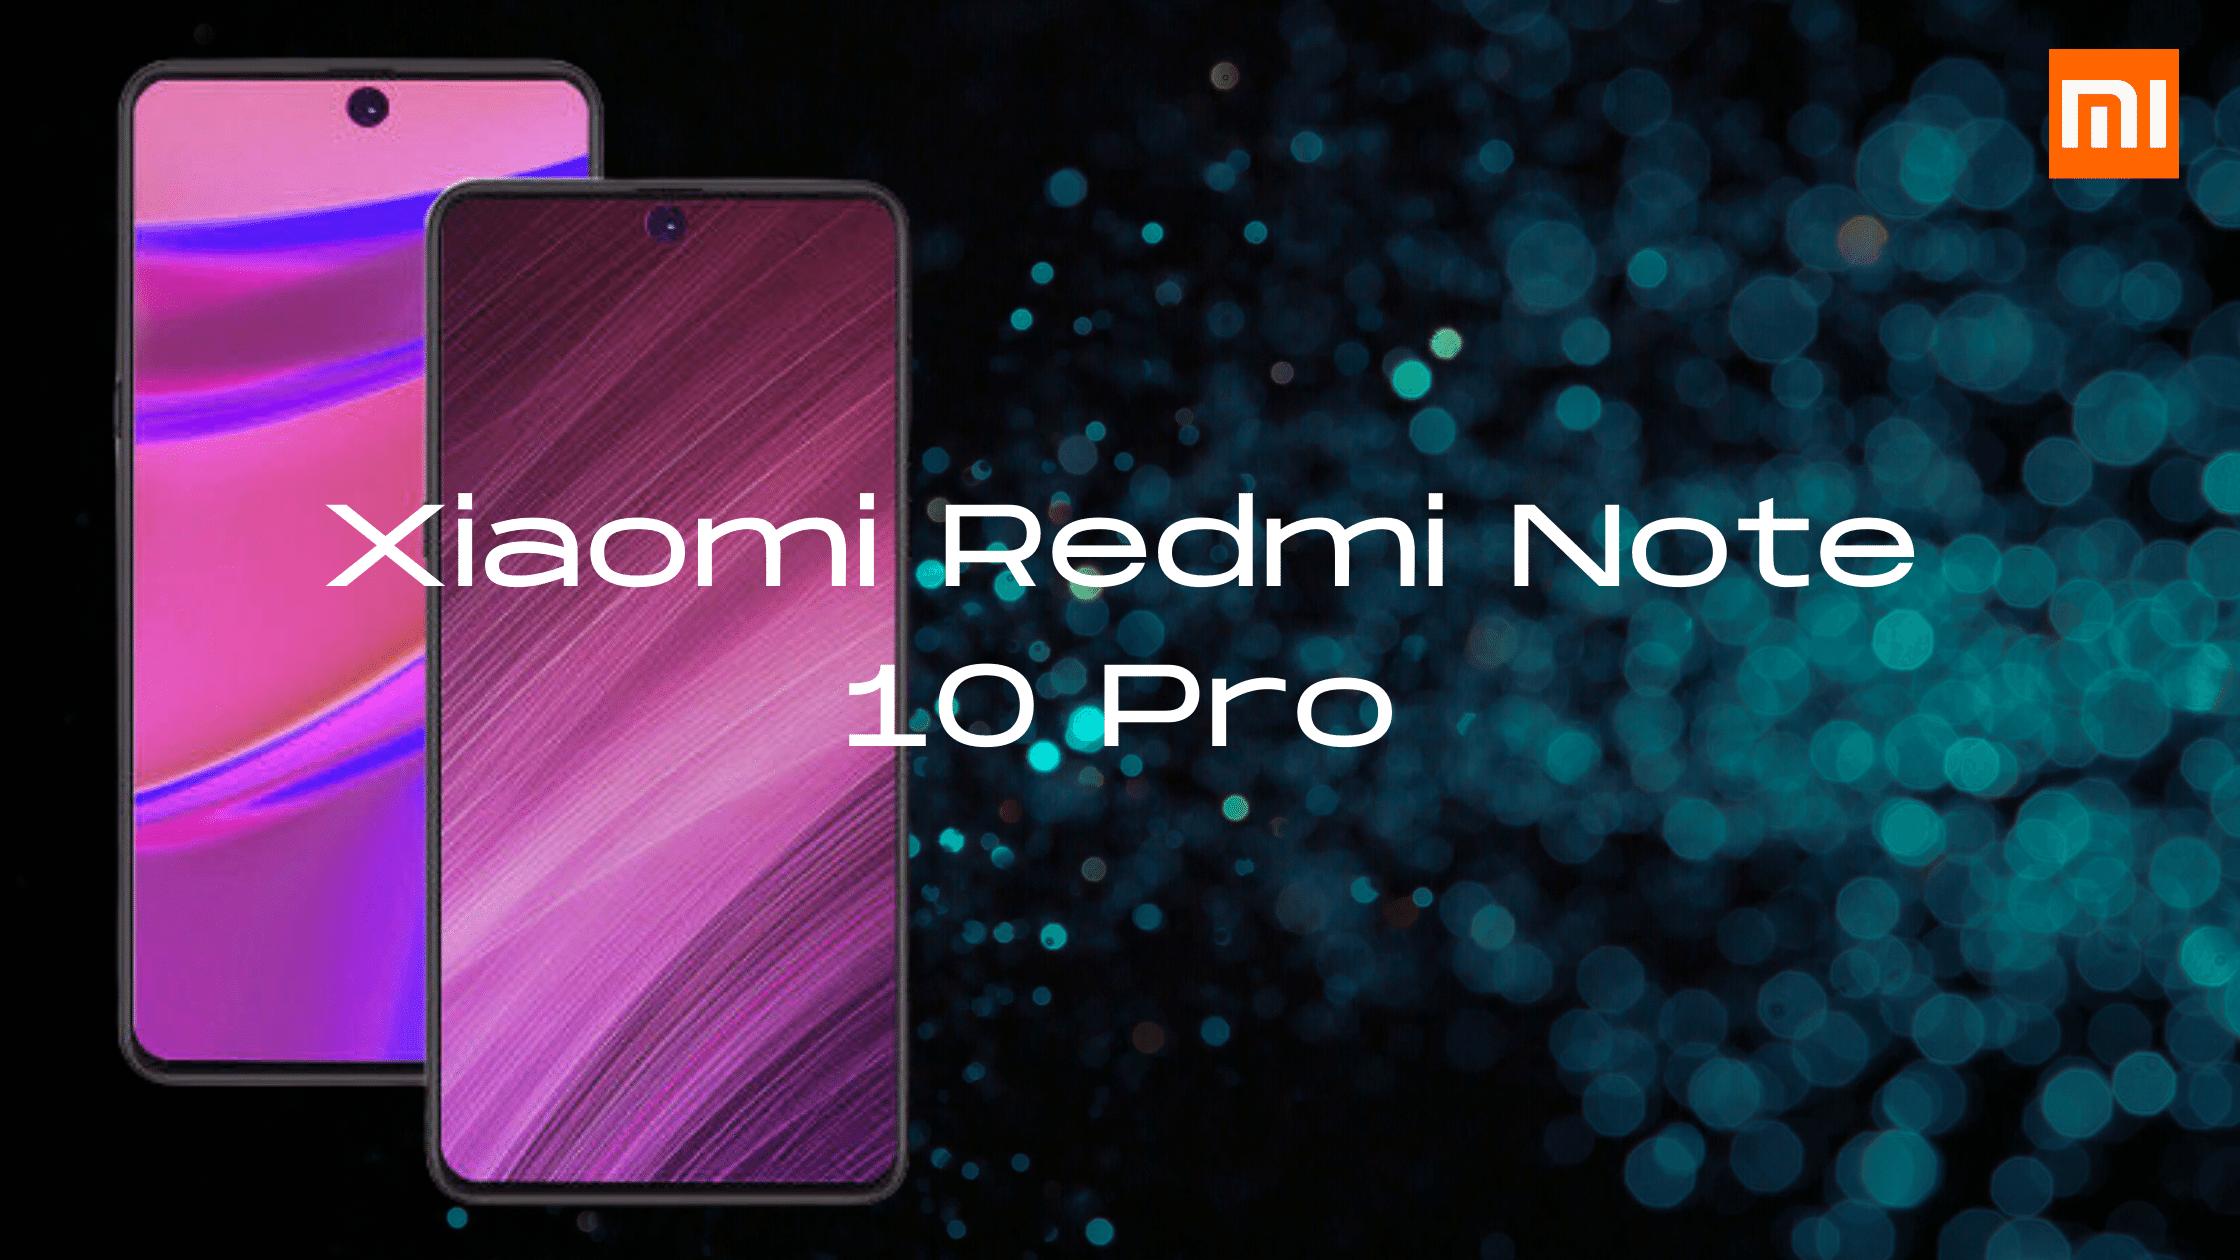 Xiaomi Redmi Note 10 Pro Price